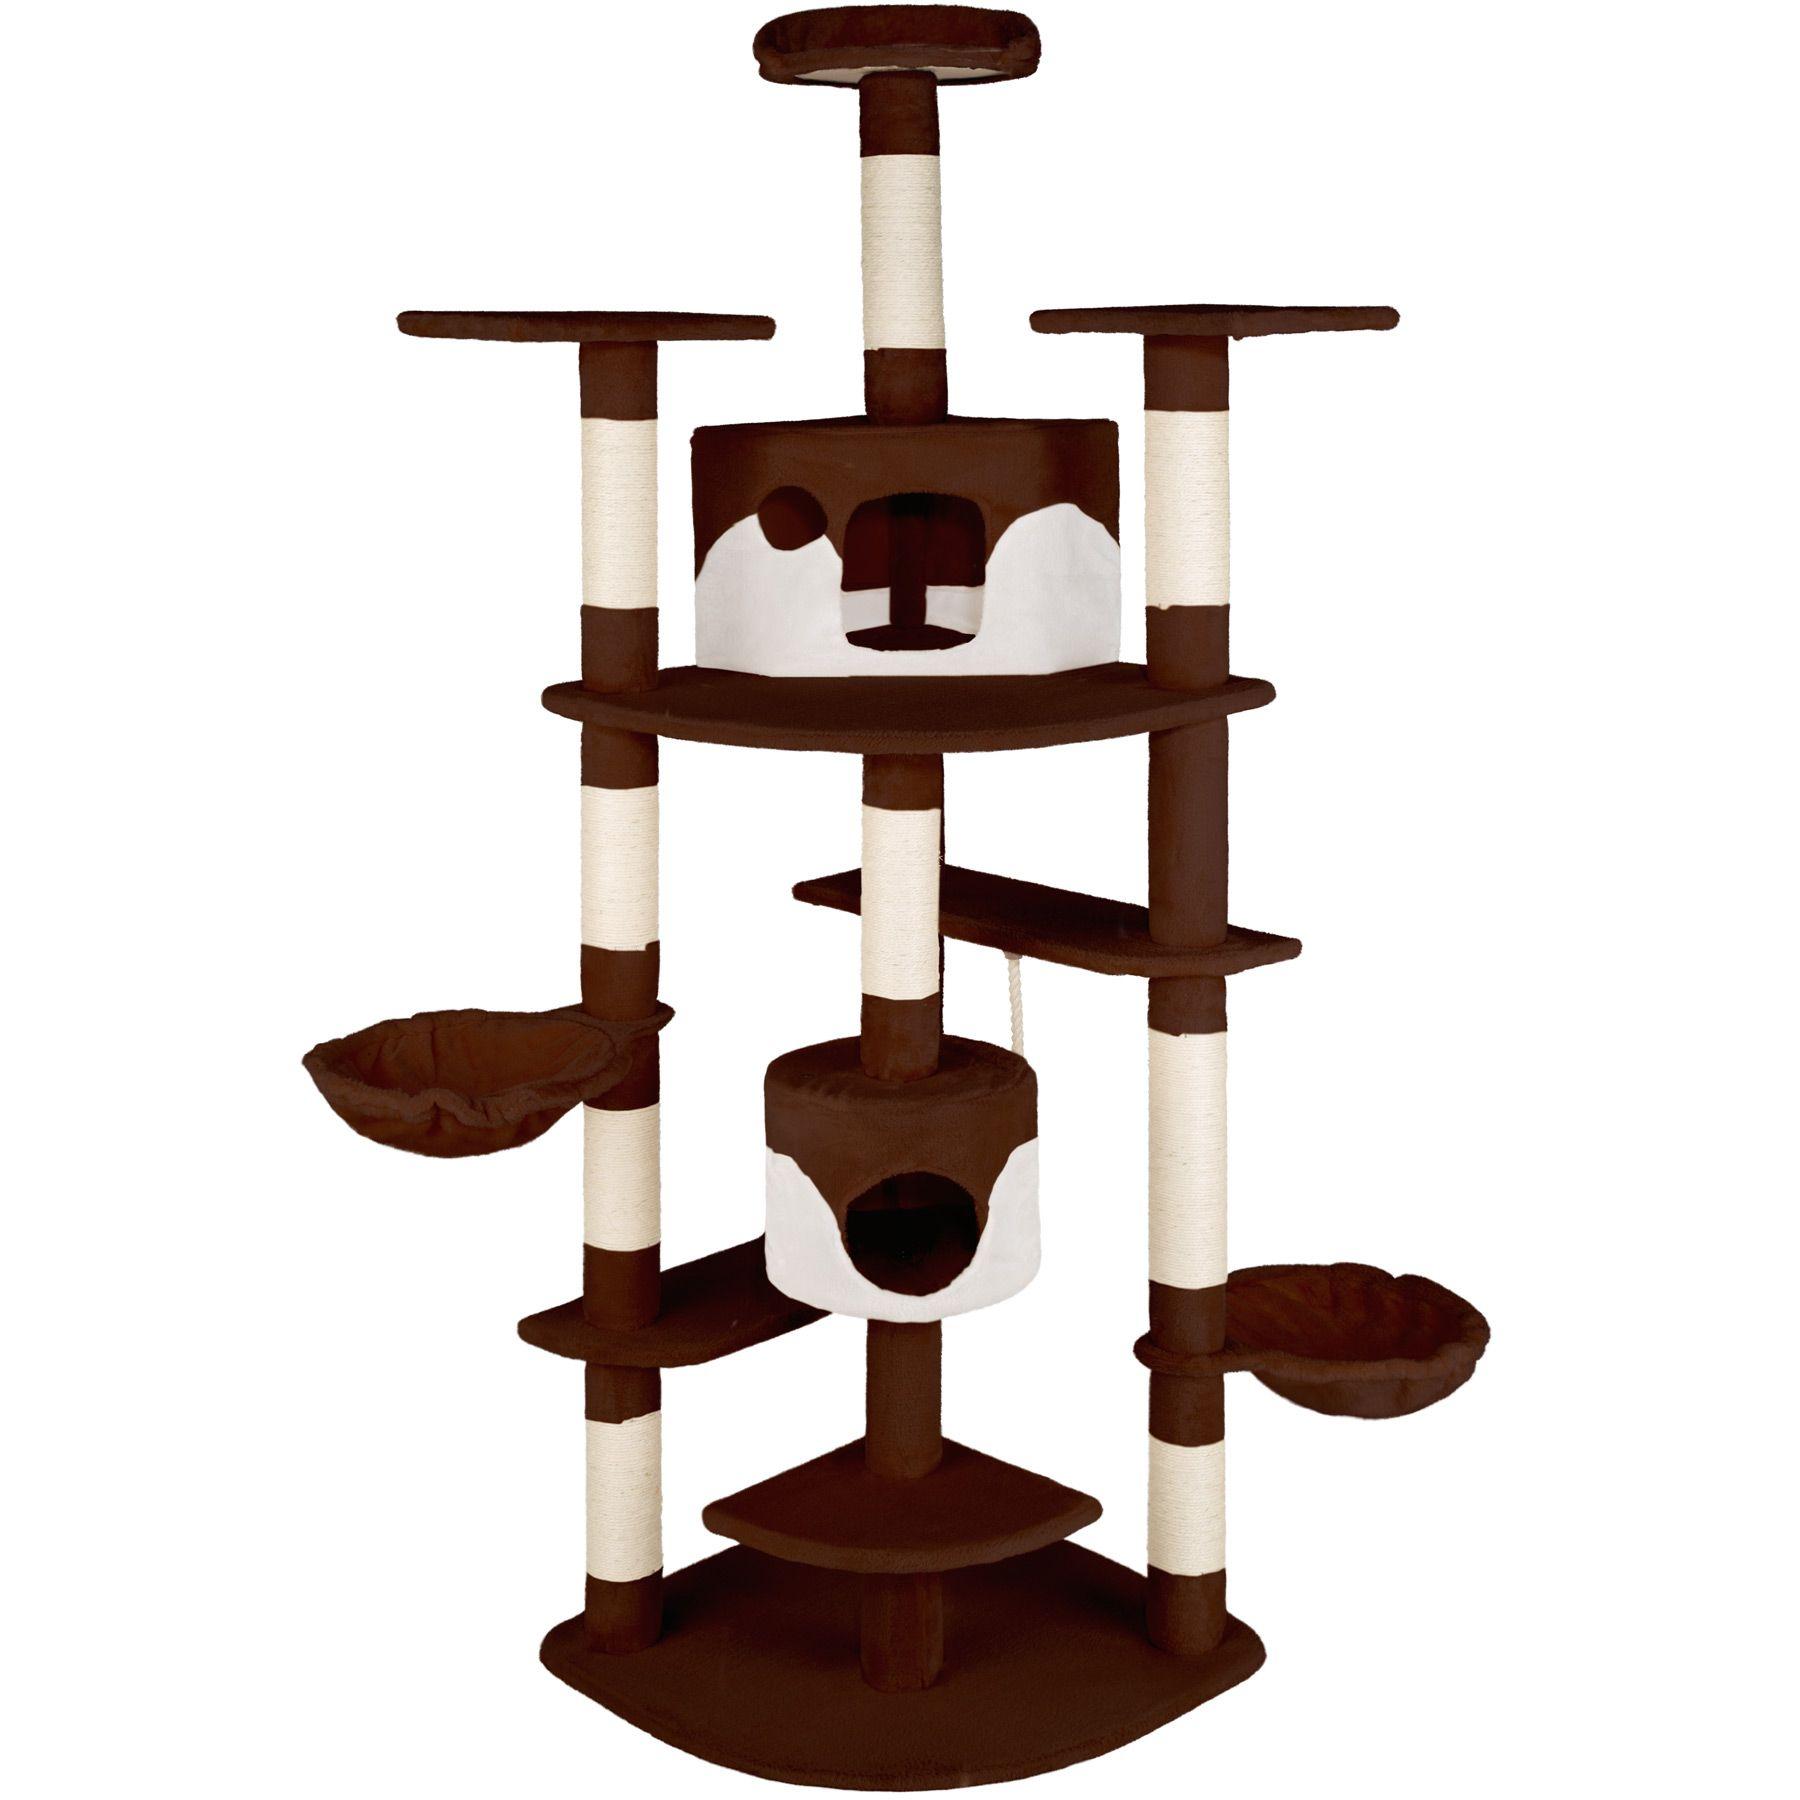 kratzbaum f r katzen katzenkratzbaum katzenbaum kletterbaum sisal ebay. Black Bedroom Furniture Sets. Home Design Ideas